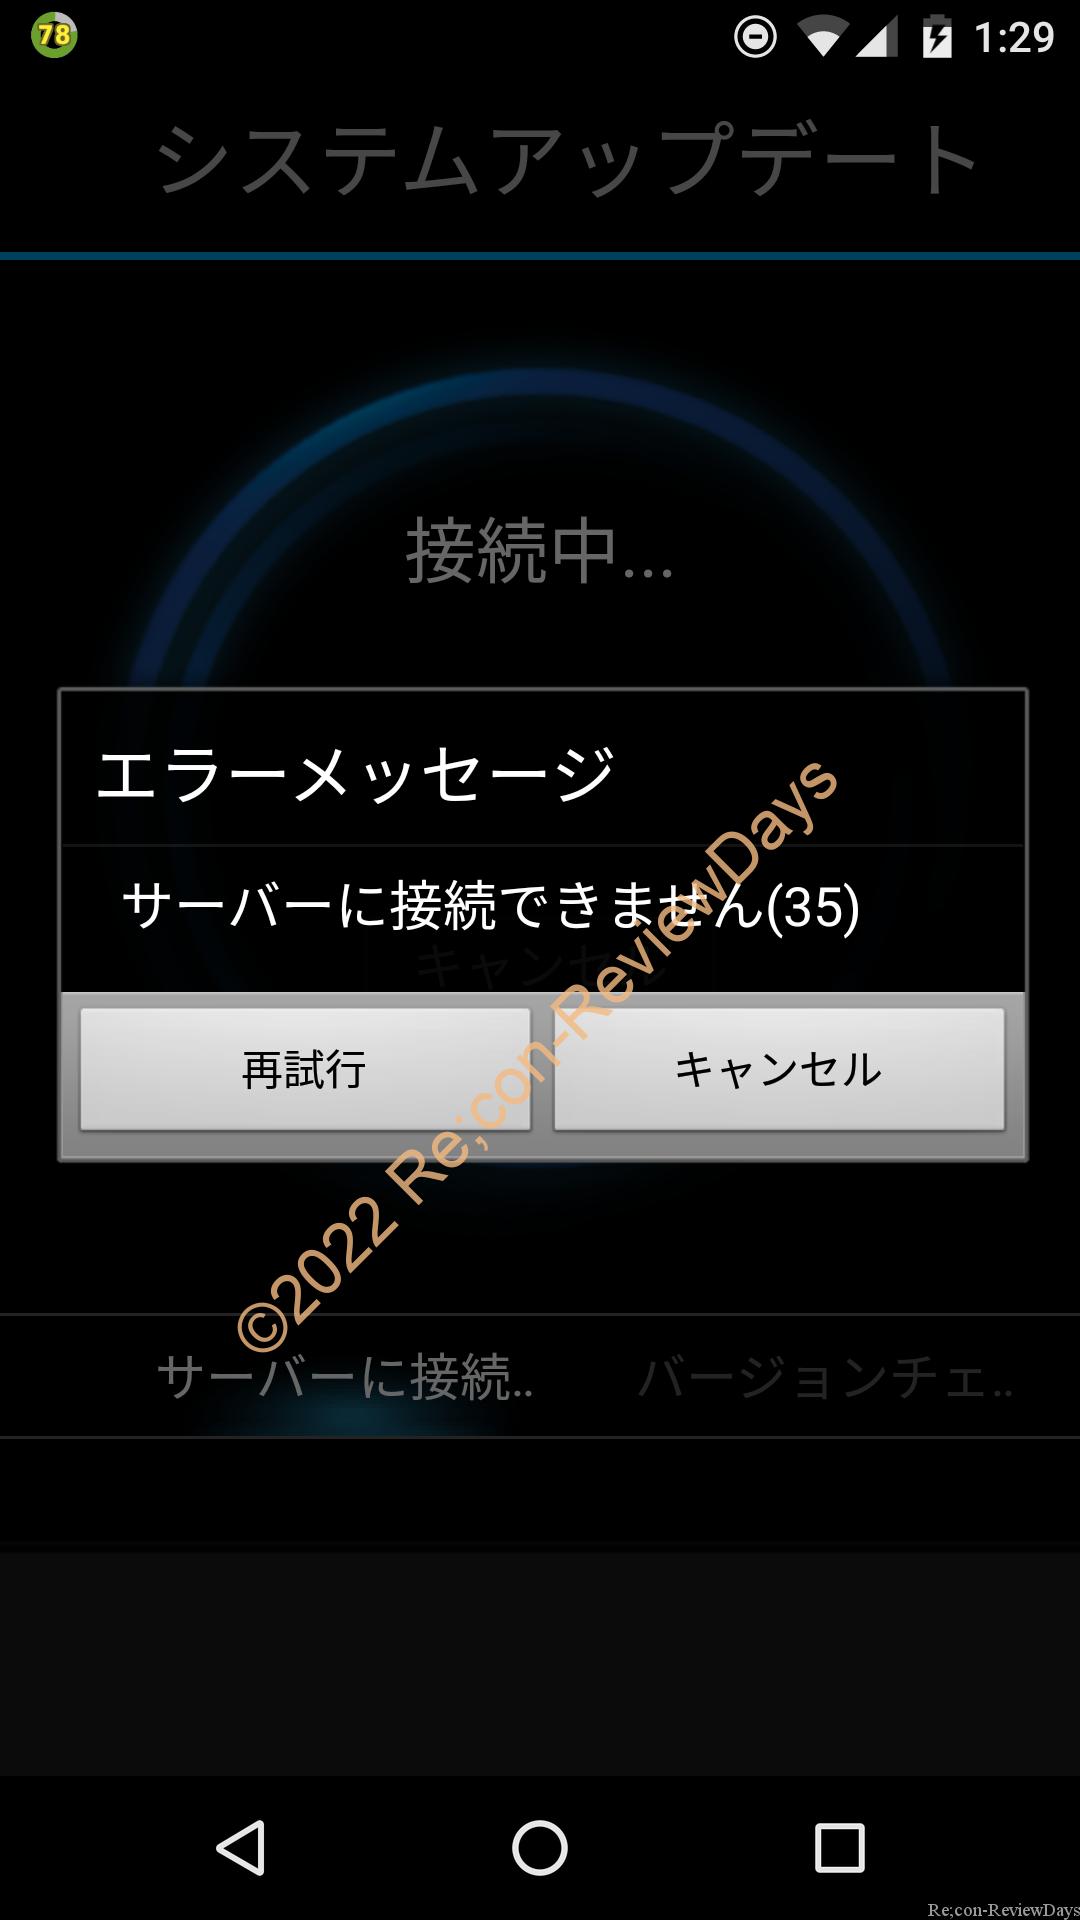 VAIO Phone A(VPA051)でアップデートサーバーに接続できない時に確認すべき事項 #VAIO #VAIOPhoneA #Android